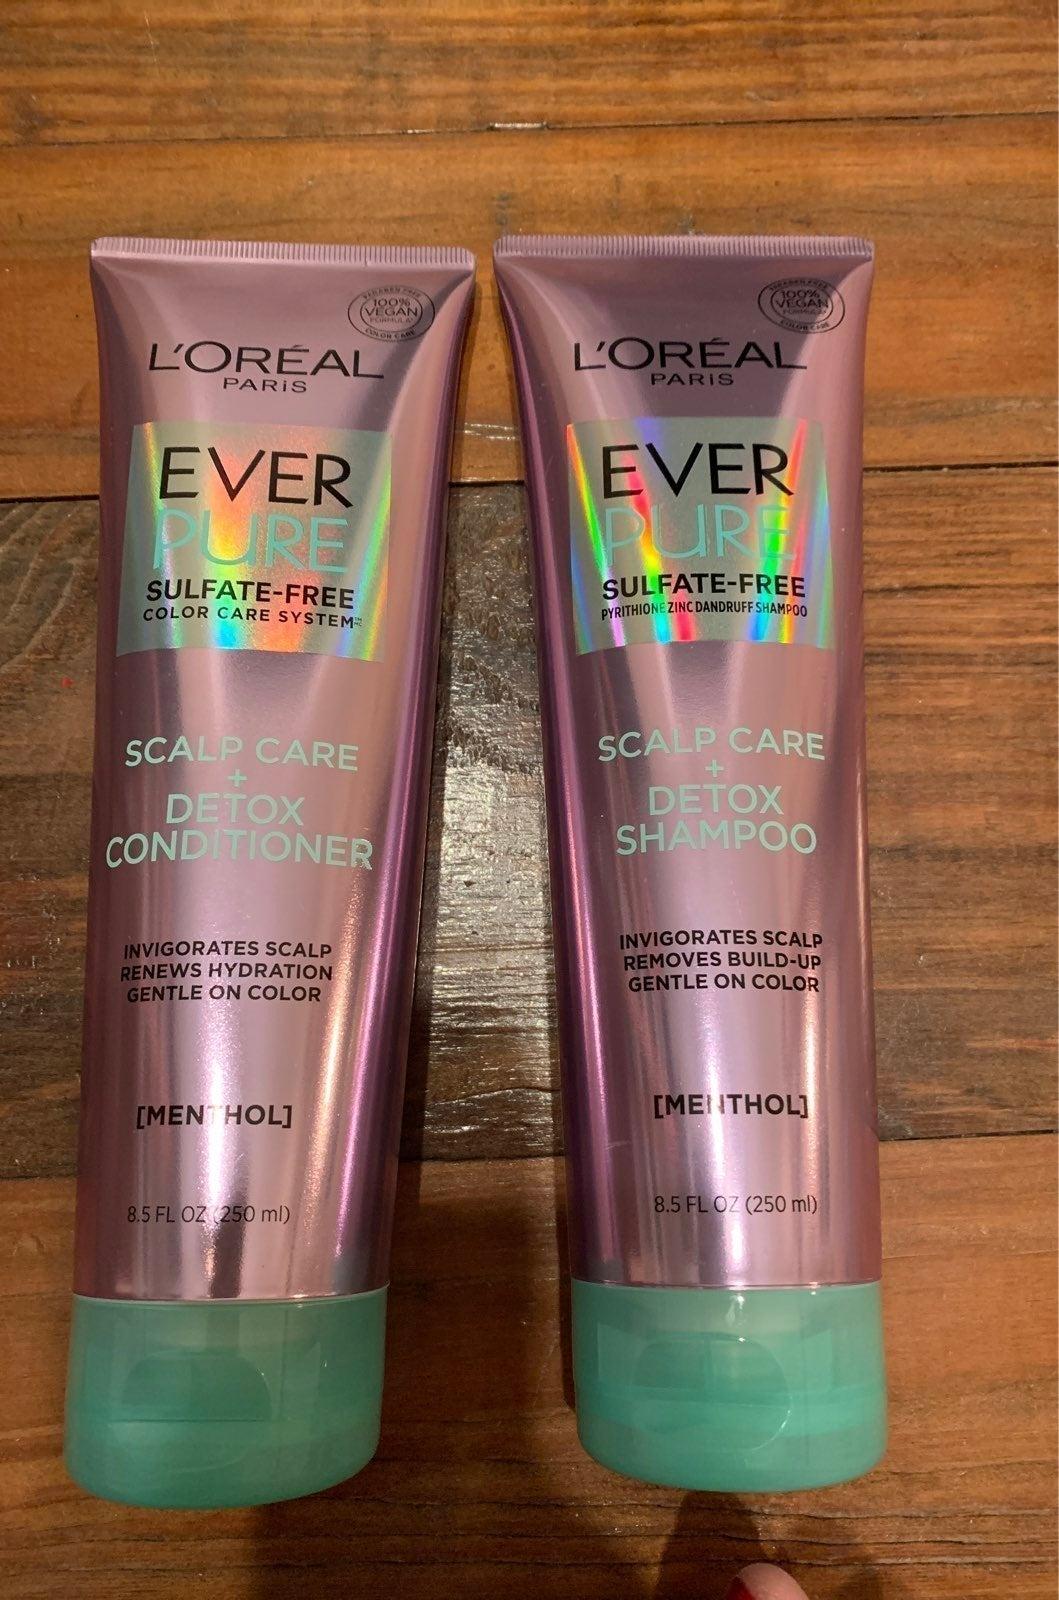 Loreal Ever Pure scalp care detox duo